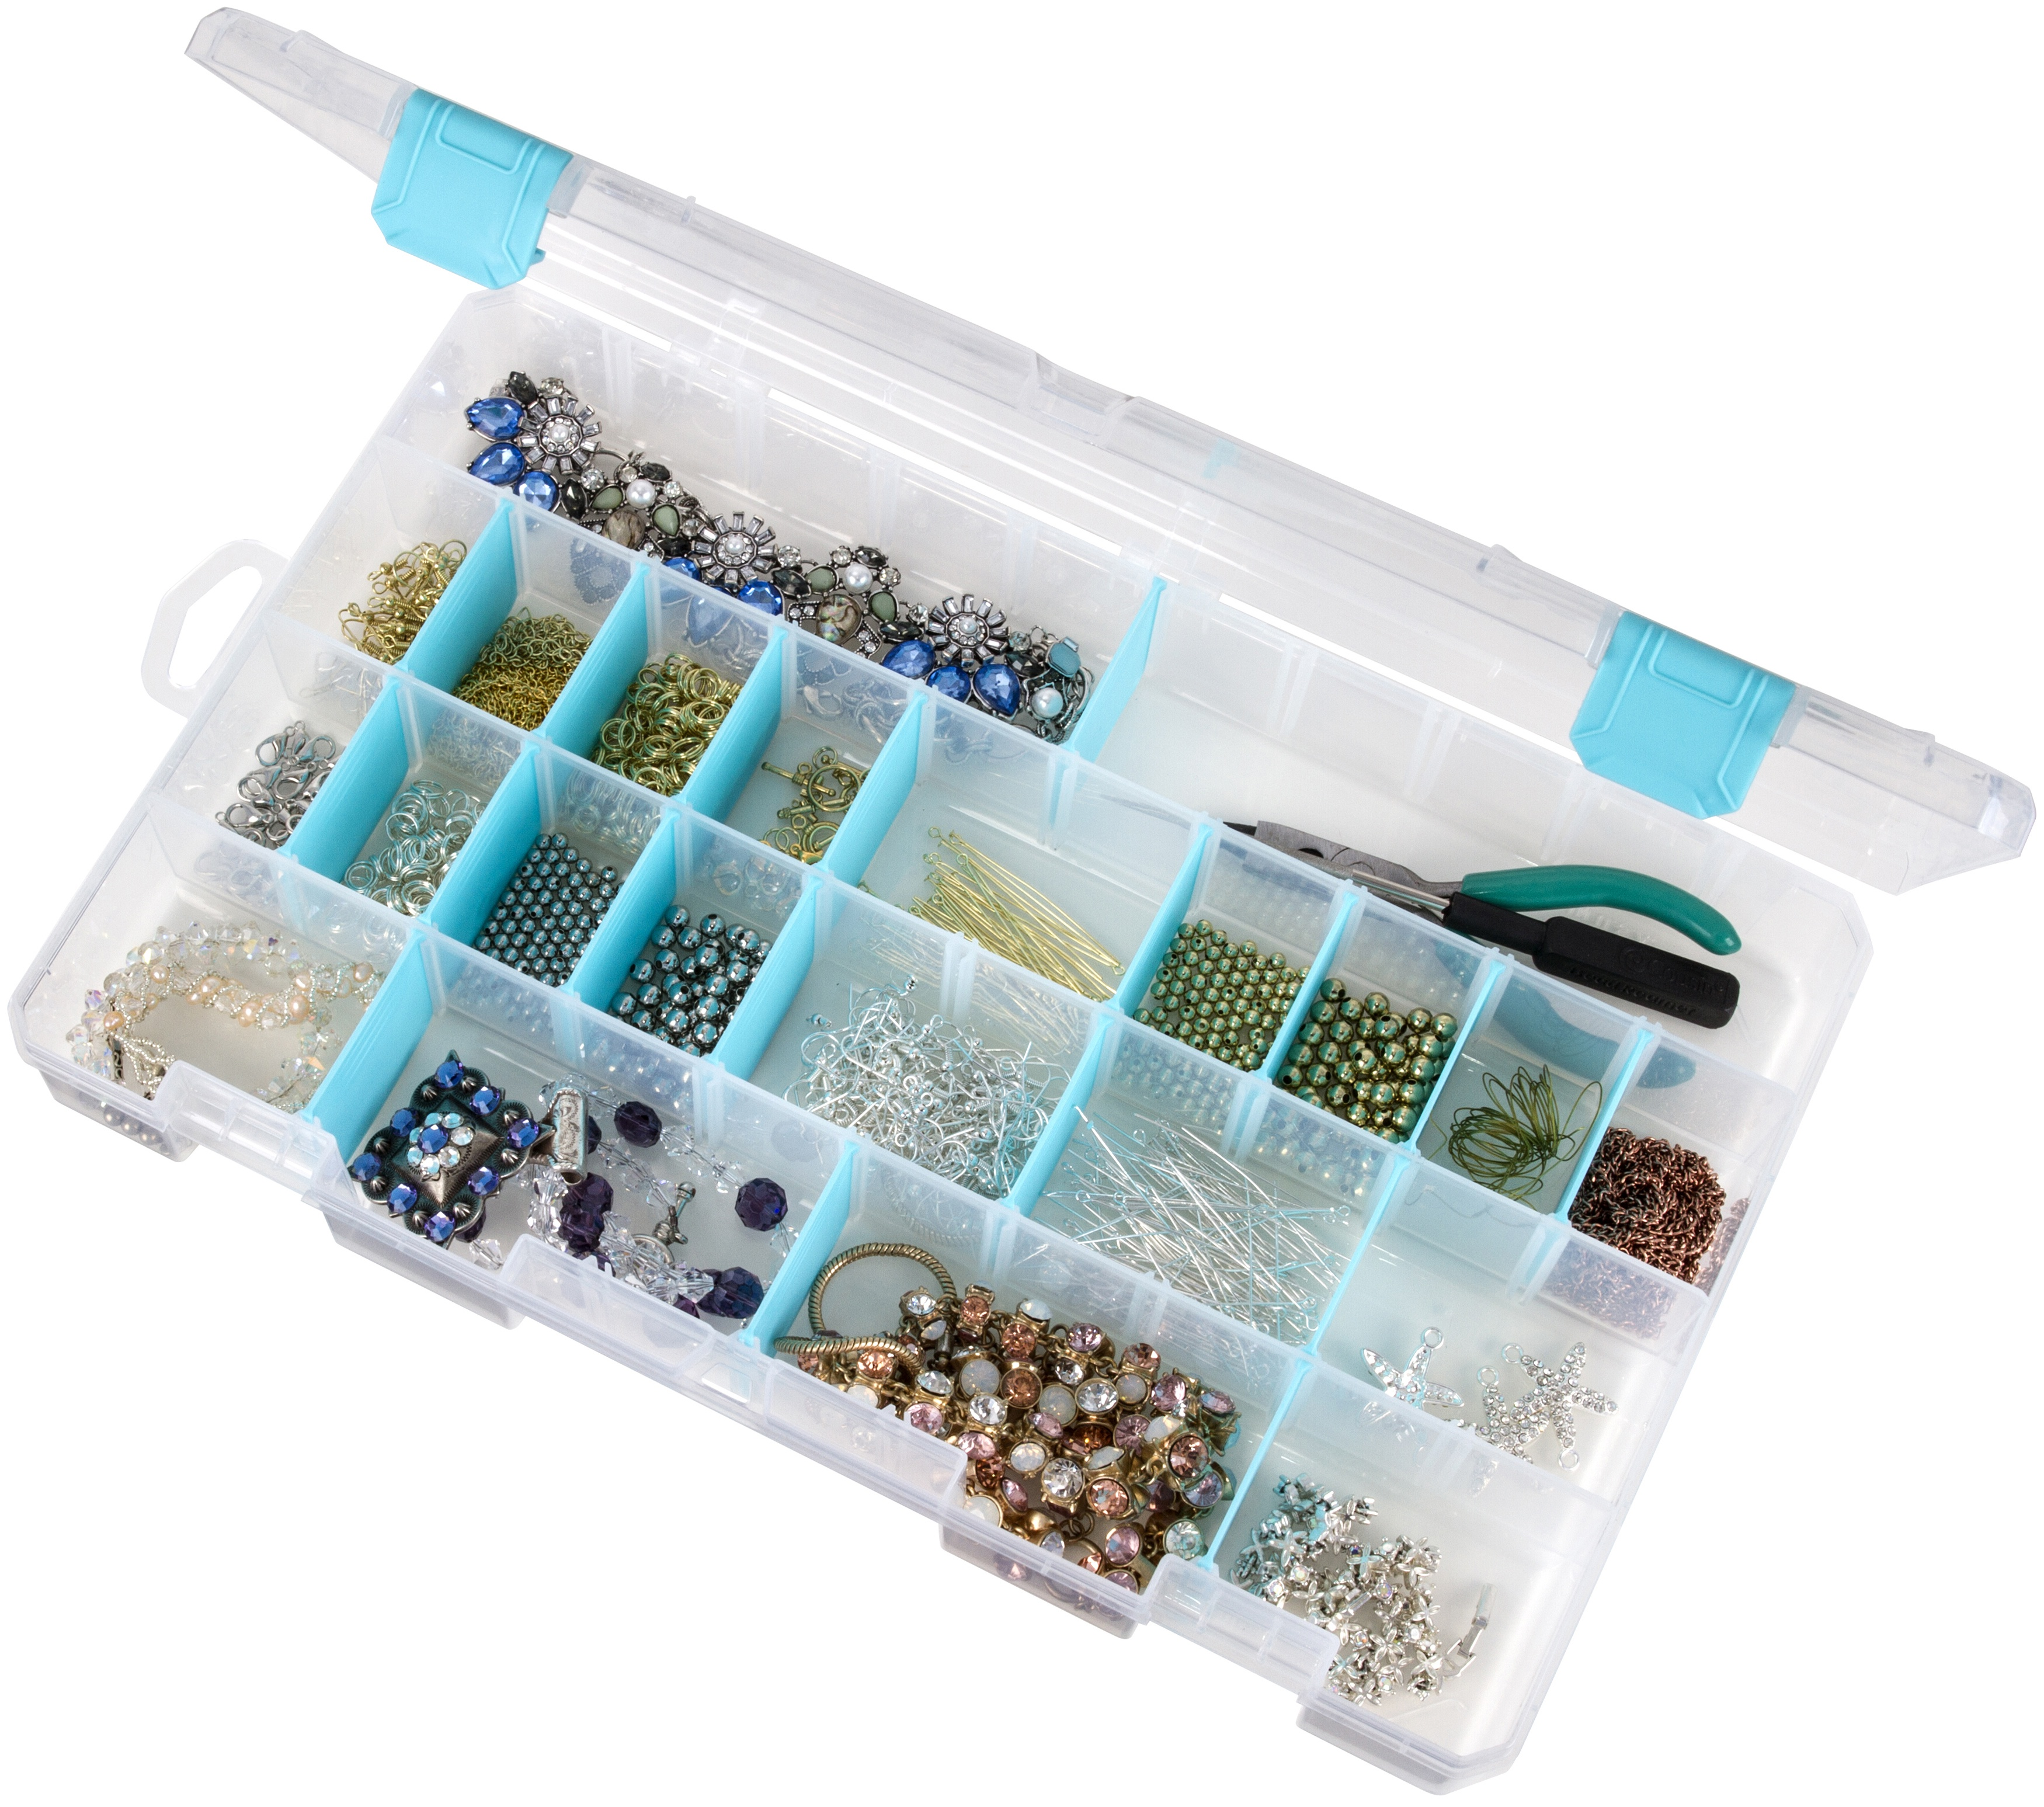 ArtBin Anti-Tarnish Solutions Box 4-15 Compartments-14X8.5X2 Translucent